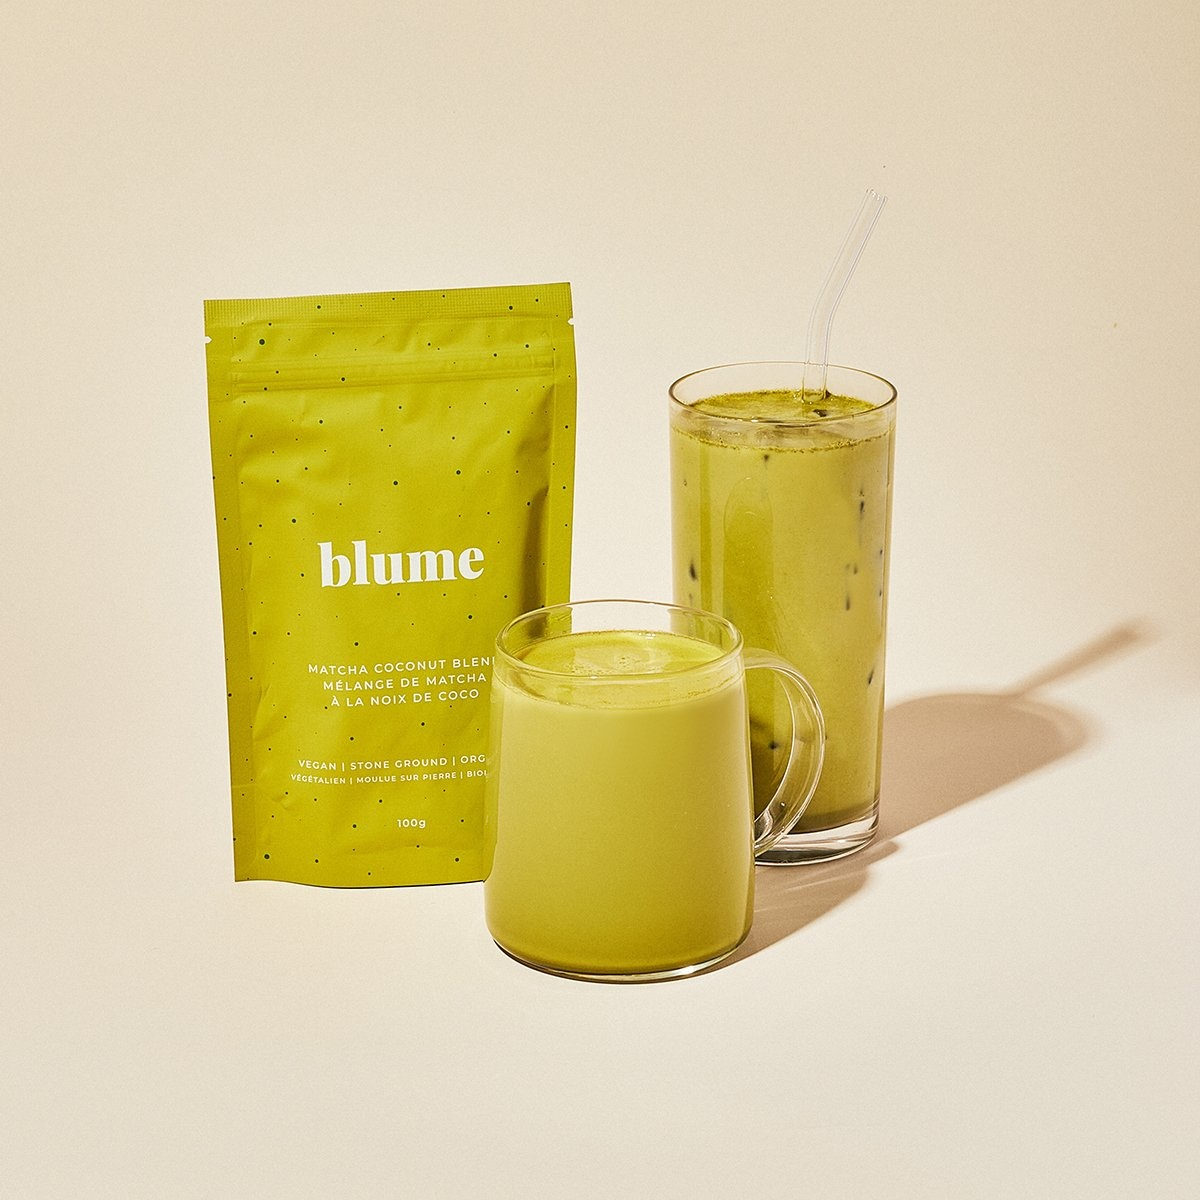 Blume Matcha Coconut Blend - 100g